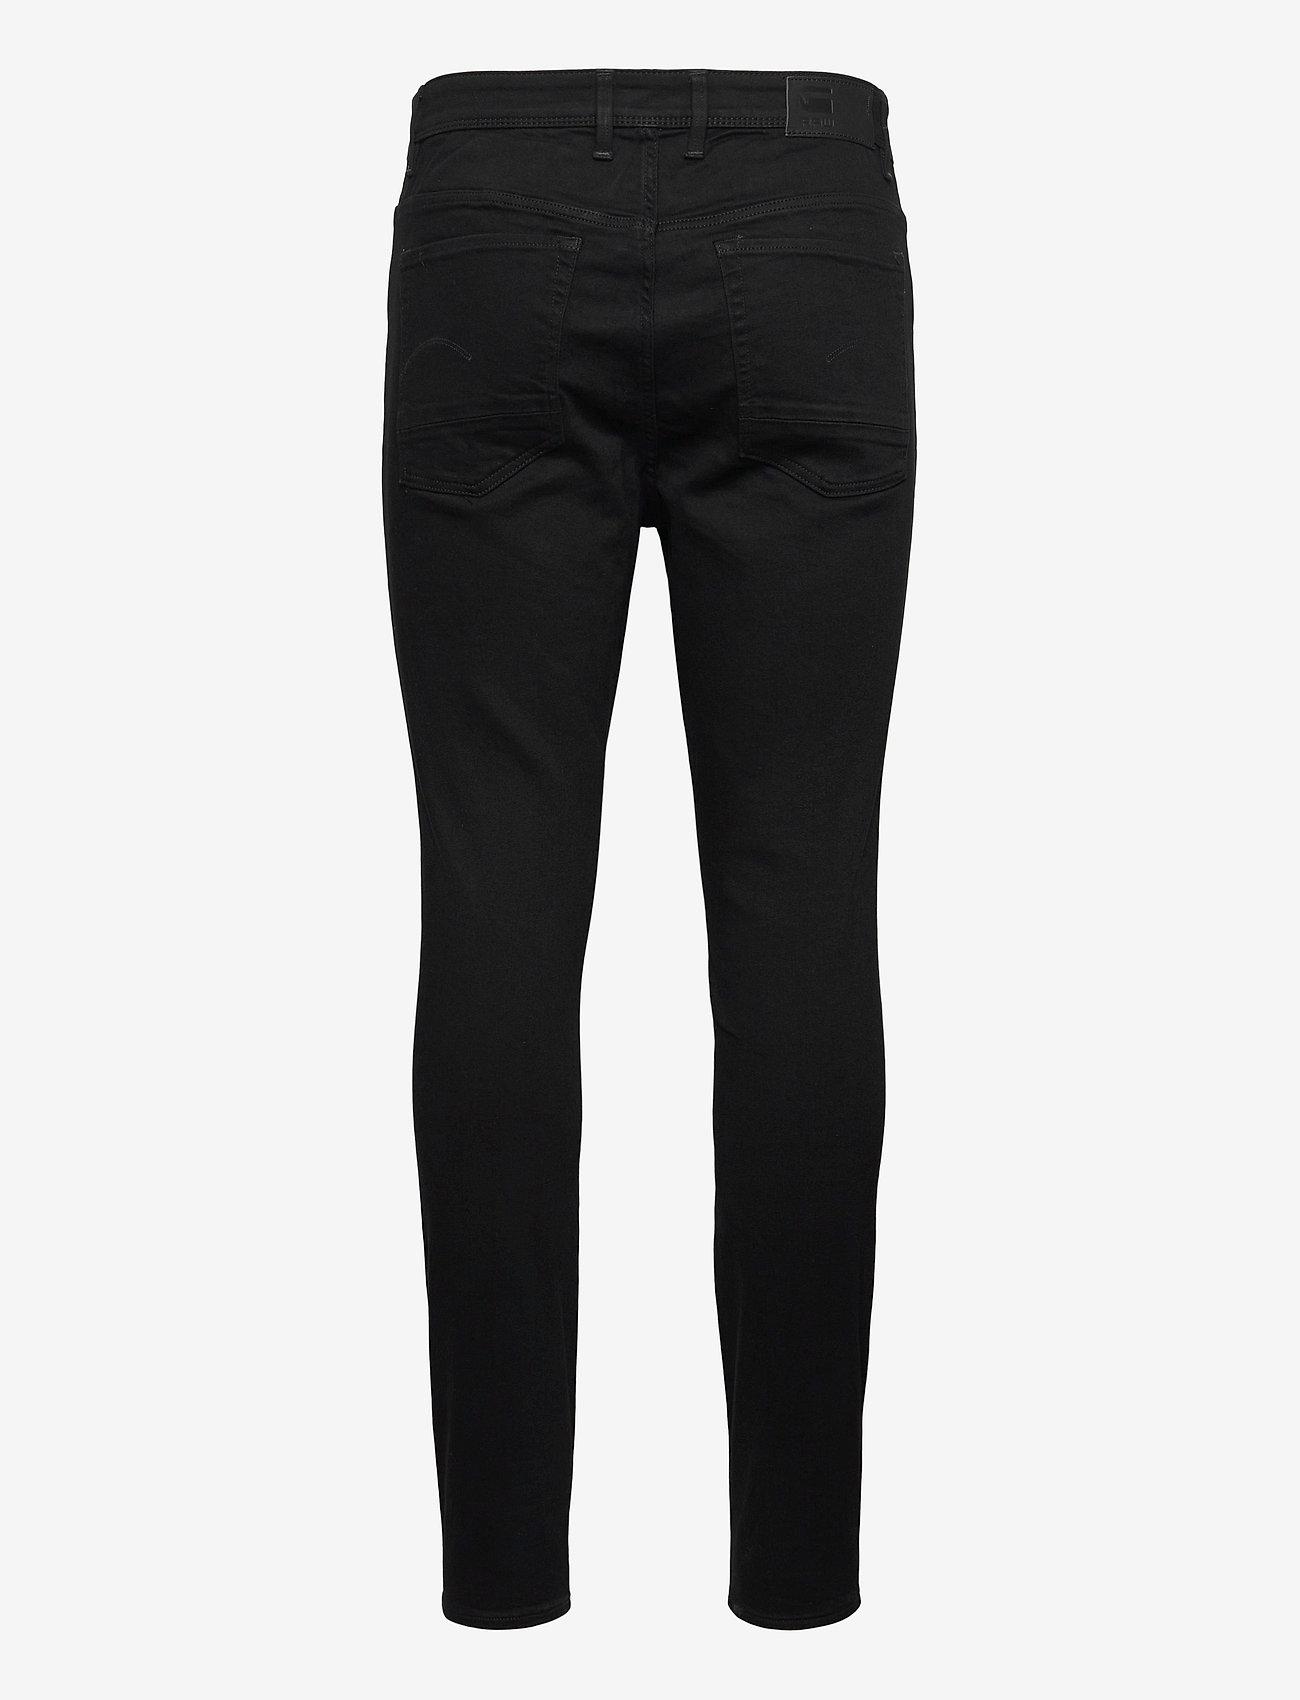 G-star RAW - Kafey Ultra High Skinny Wmn - skinny jeans - pitch black - 1